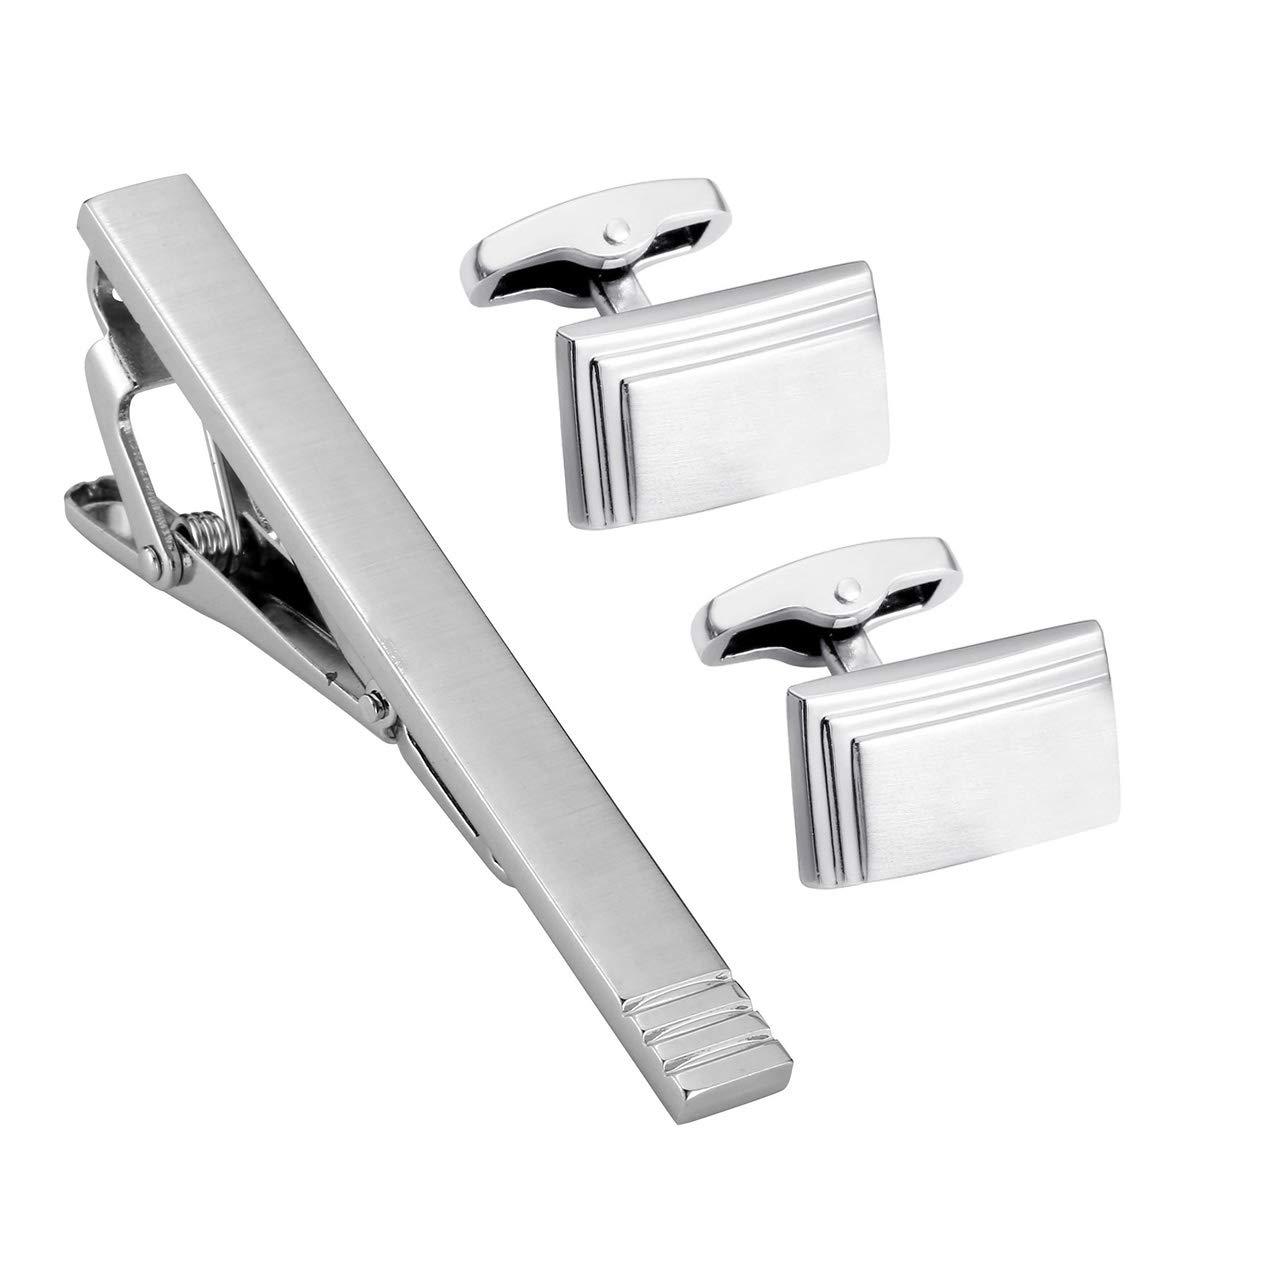 PiercingJ 3pcs Personalized Custom Engrave Name Initial Tie Clip Cufflinks Set Tie Pins Bar Cuff Link Shirt Studs Set Father Mens Business Wedding Shirts + Gift Box